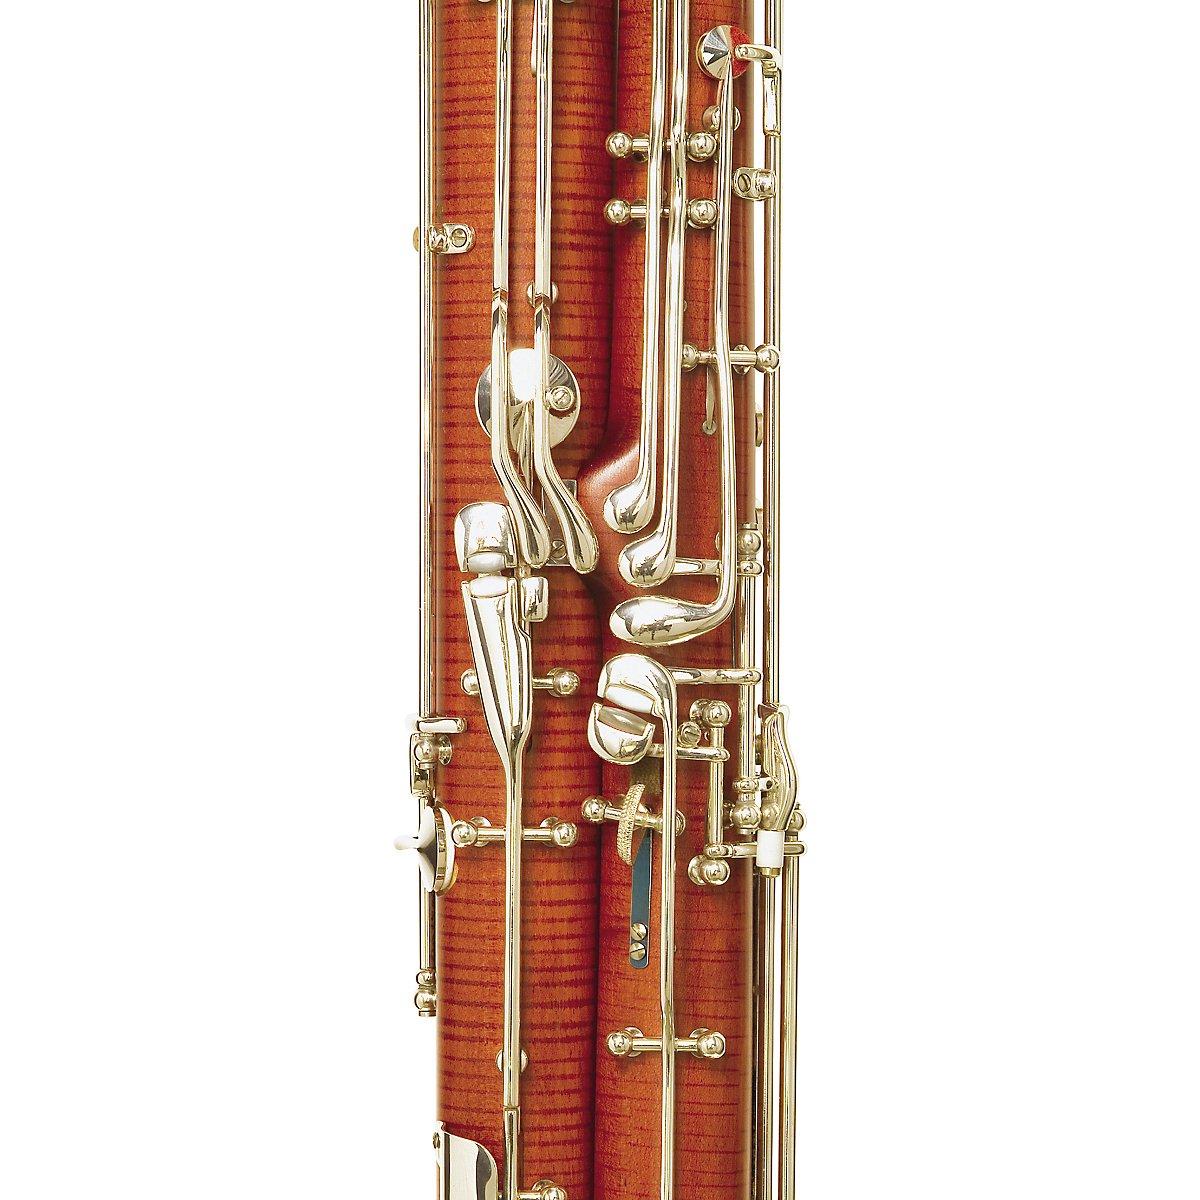 J Puchner Model 6000 Superior Professional Bassoon Antique Finish